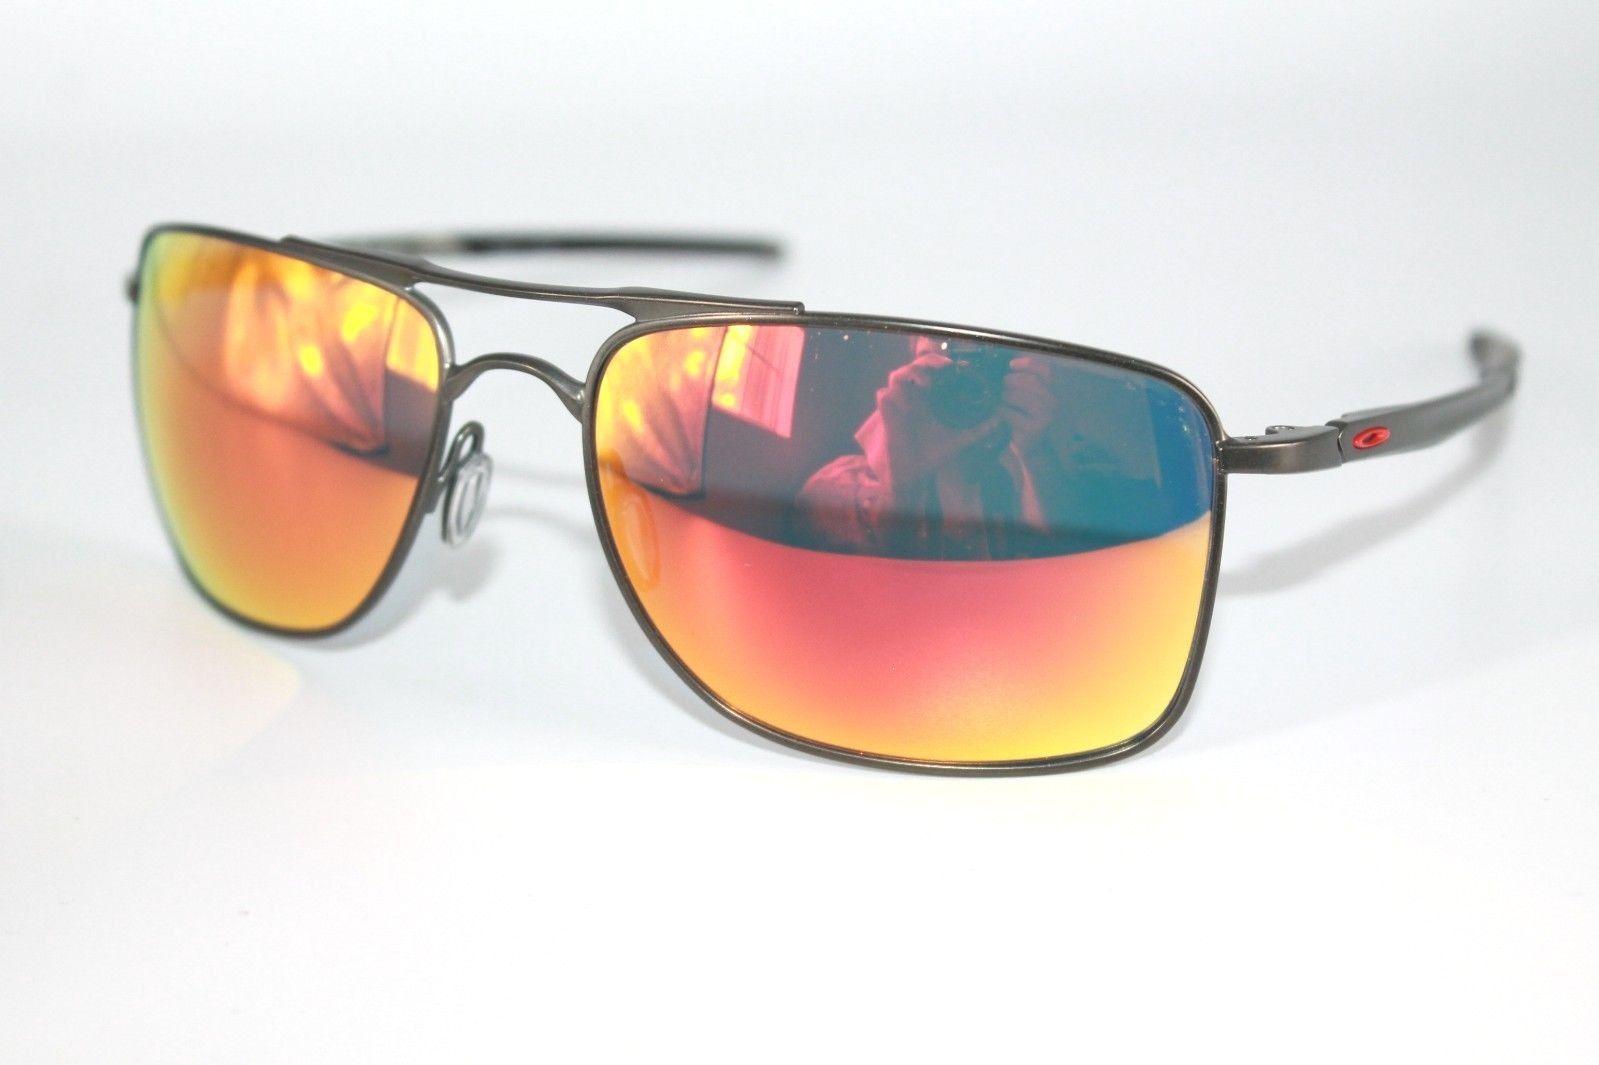 bc2873fb8b 57. 57. Oakley Gauge 8 Sunglasses OO4124-03 Matte Carbon Frame W  Ruby  Iridium Lens 57mm · Oakley Gauge ...